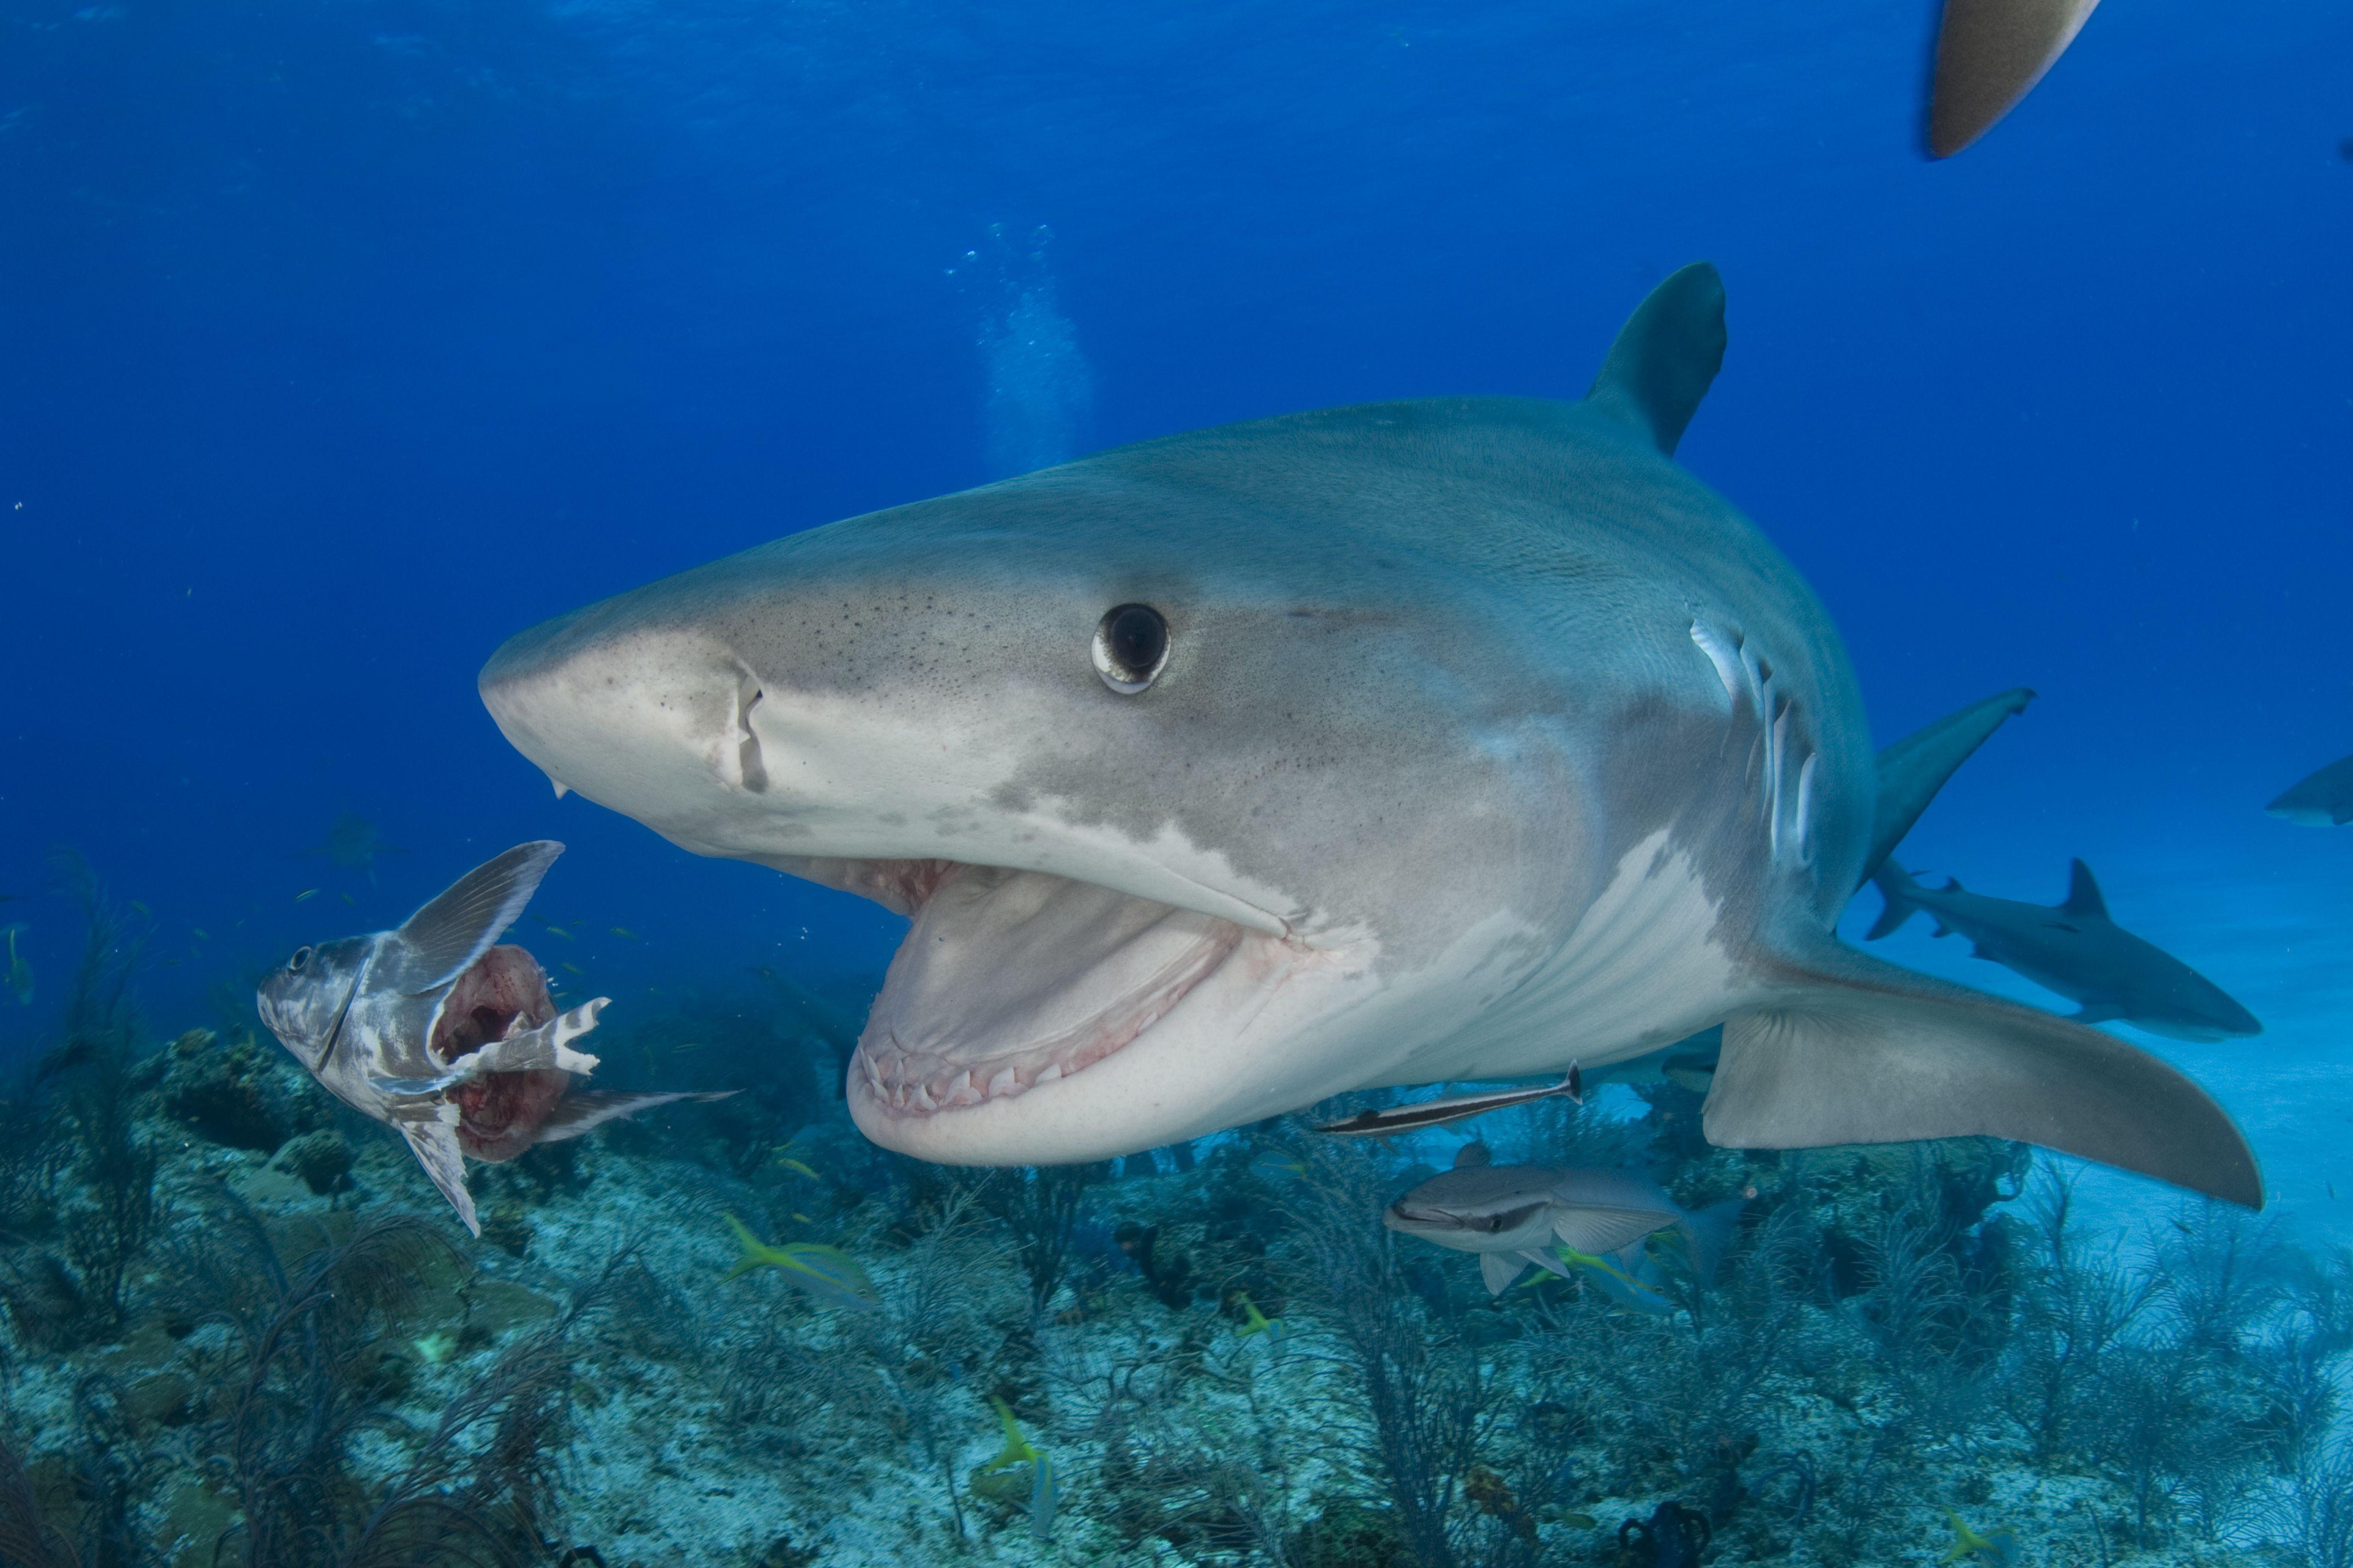 акулы фото с названиями полностью